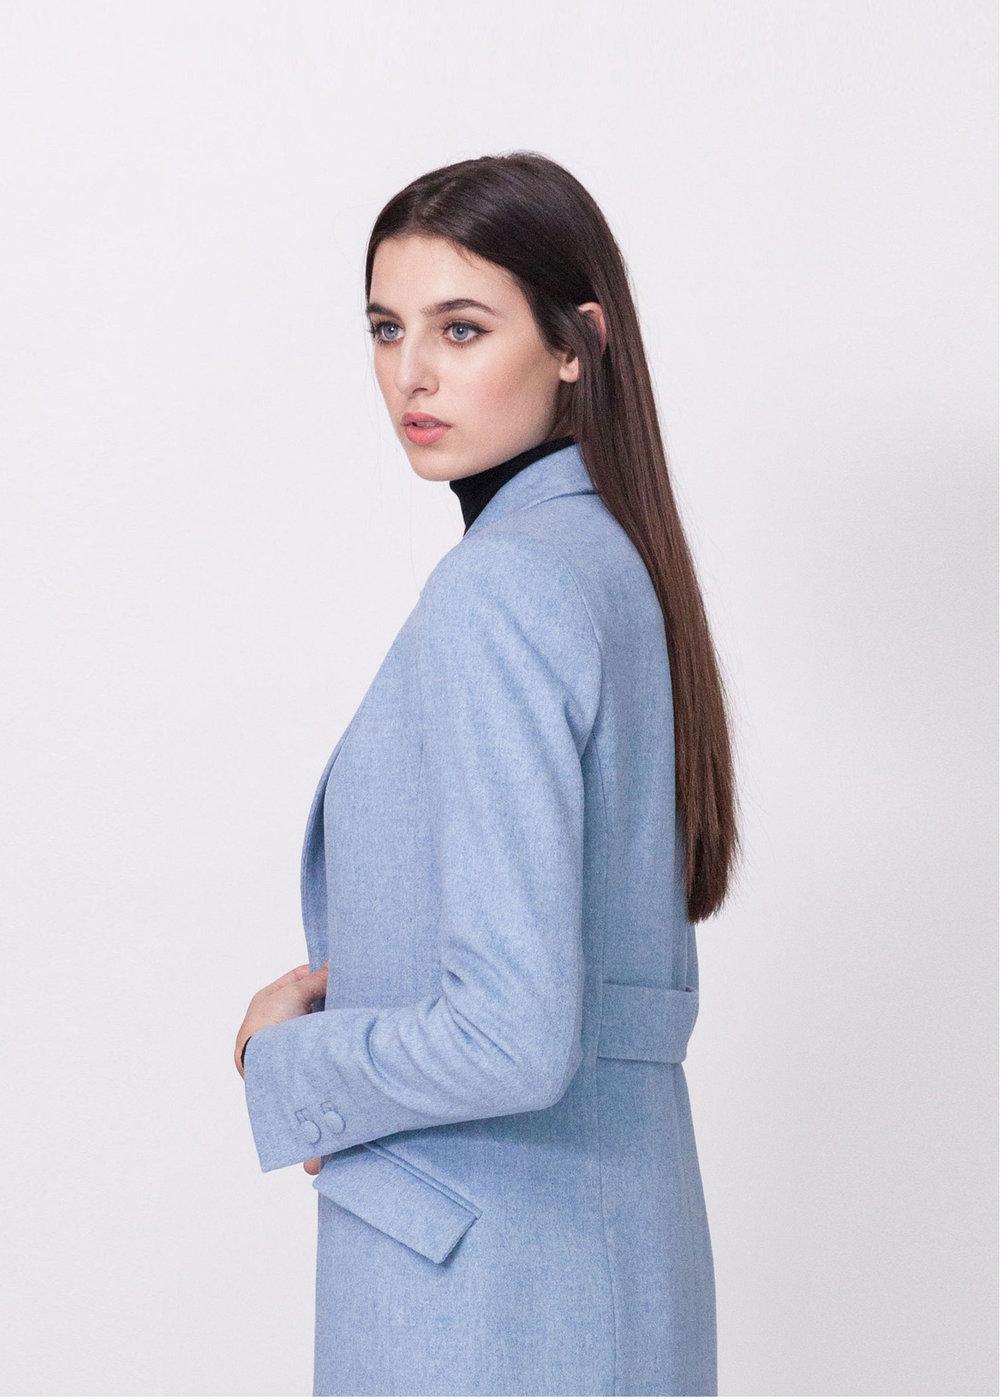 Portrait-Blue-Coat.jpg